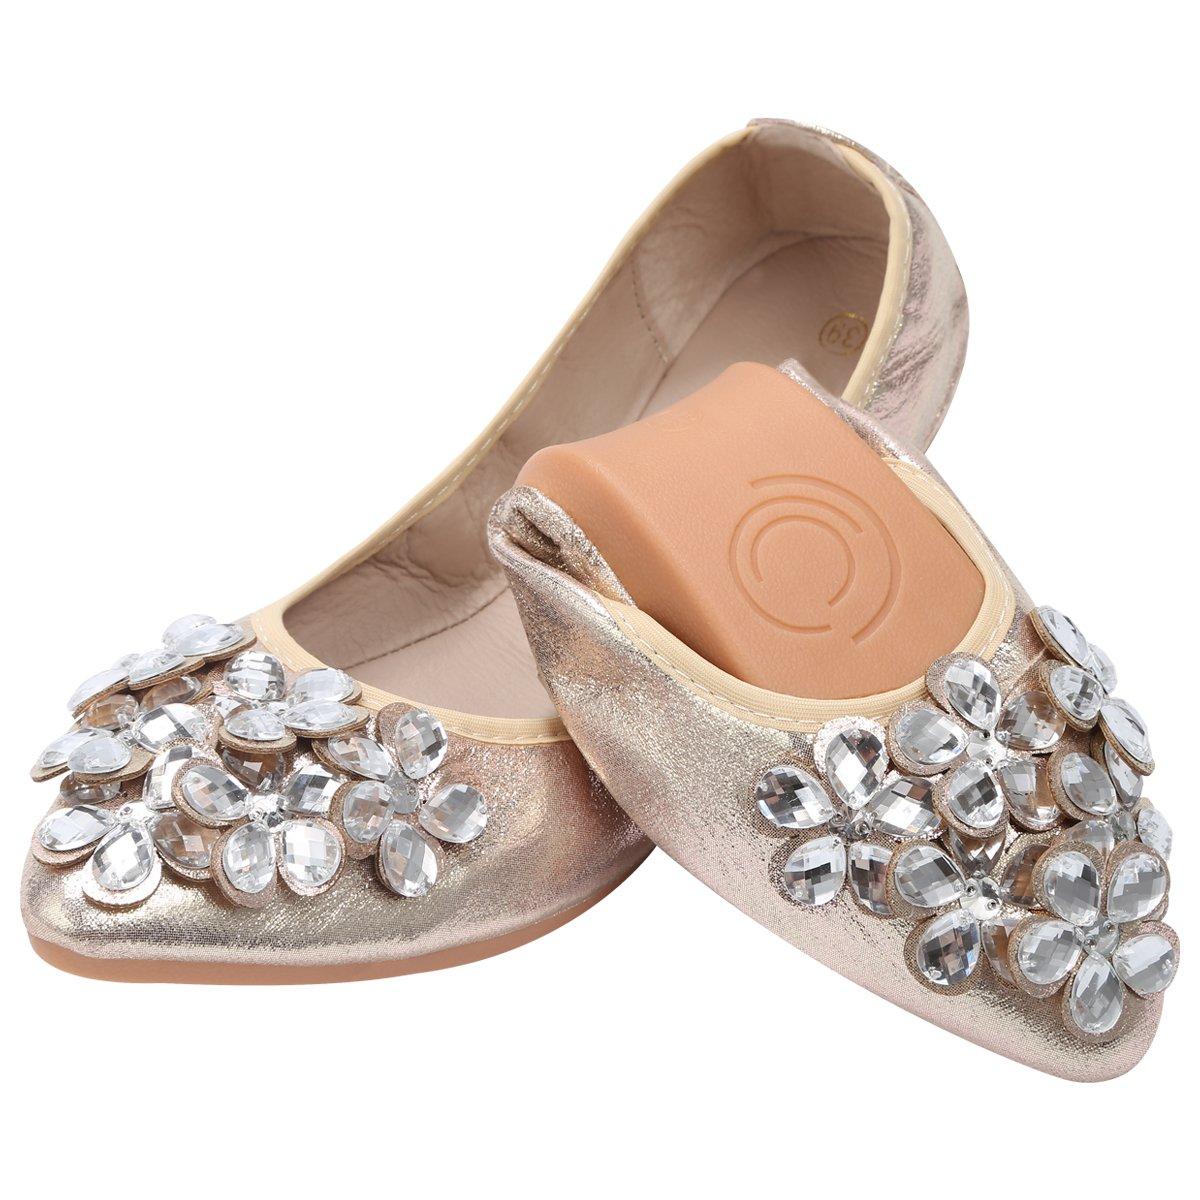 24652c442 KUNSHOP Women Ballet Flats Rhinestone Wedding Ballerina Shoes Foldable Sparkly  Bridal Sandals - Casual Women s Shoes